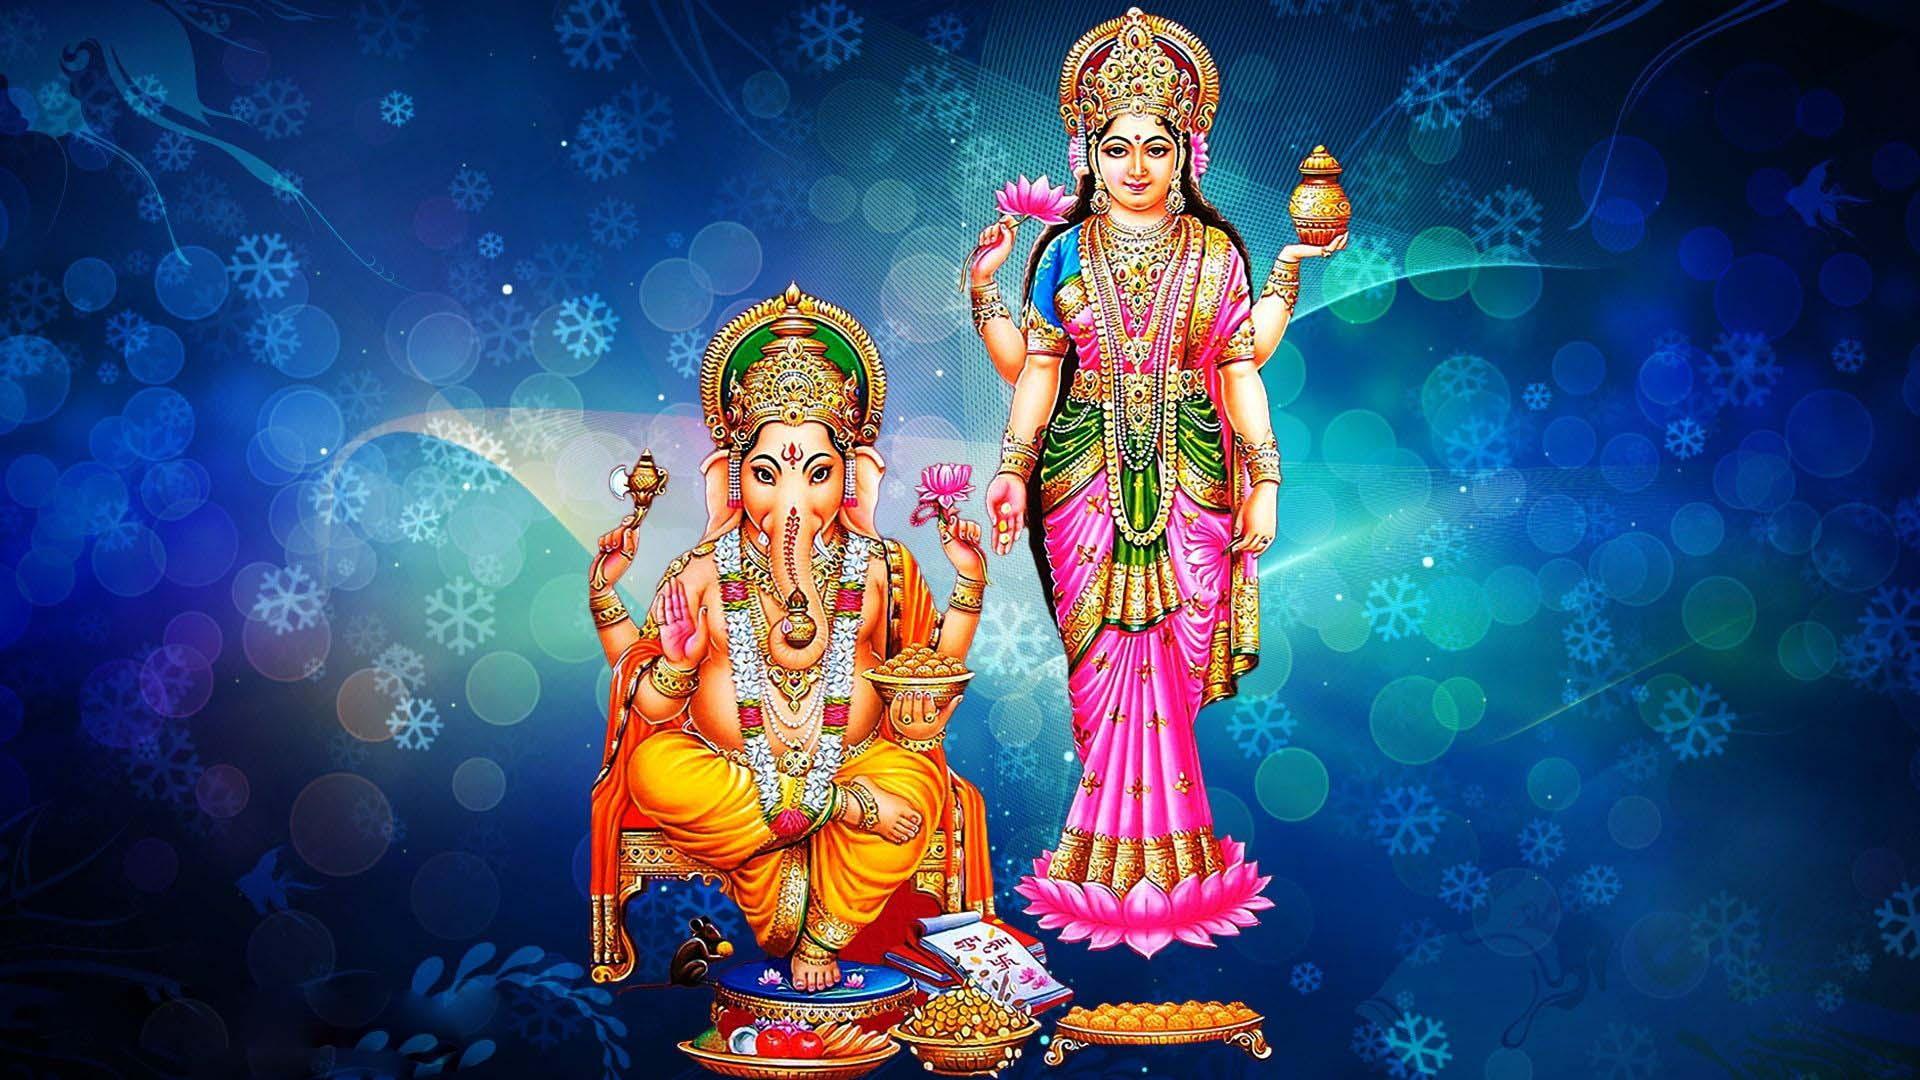 Laxmi Ganesh Ji Images Goddess Maa Lakshmi